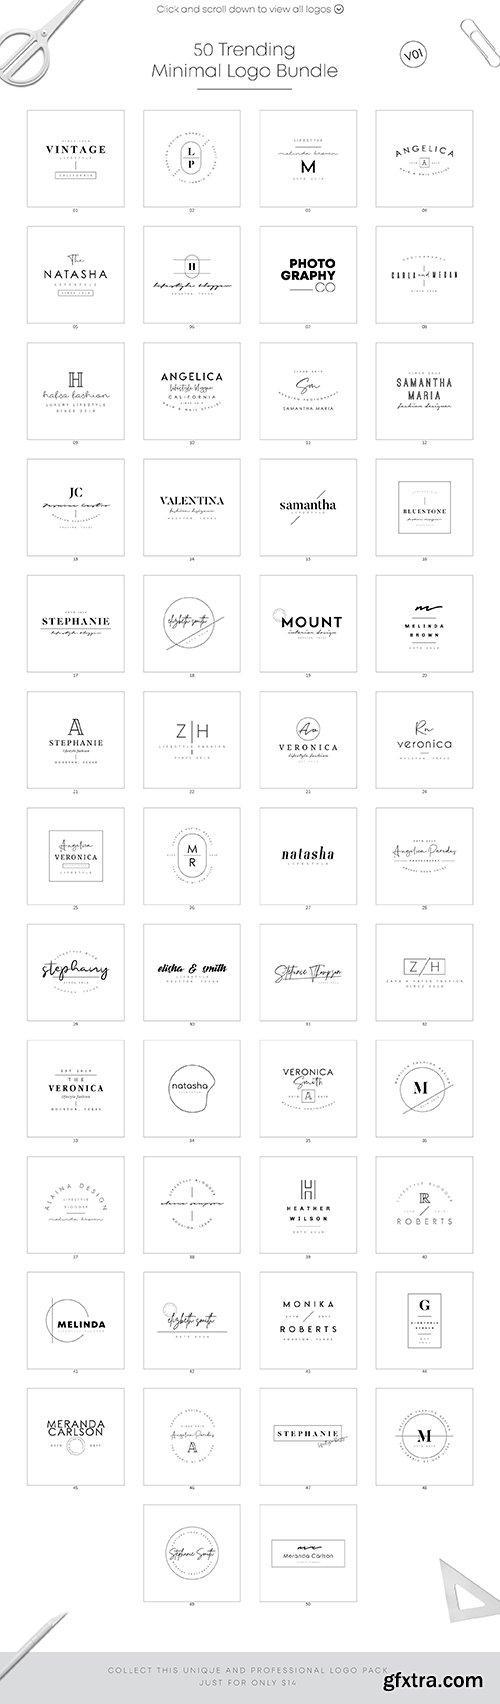 CreativeMarket - 50 Trending Minimal Logo Bundle V01 3567383